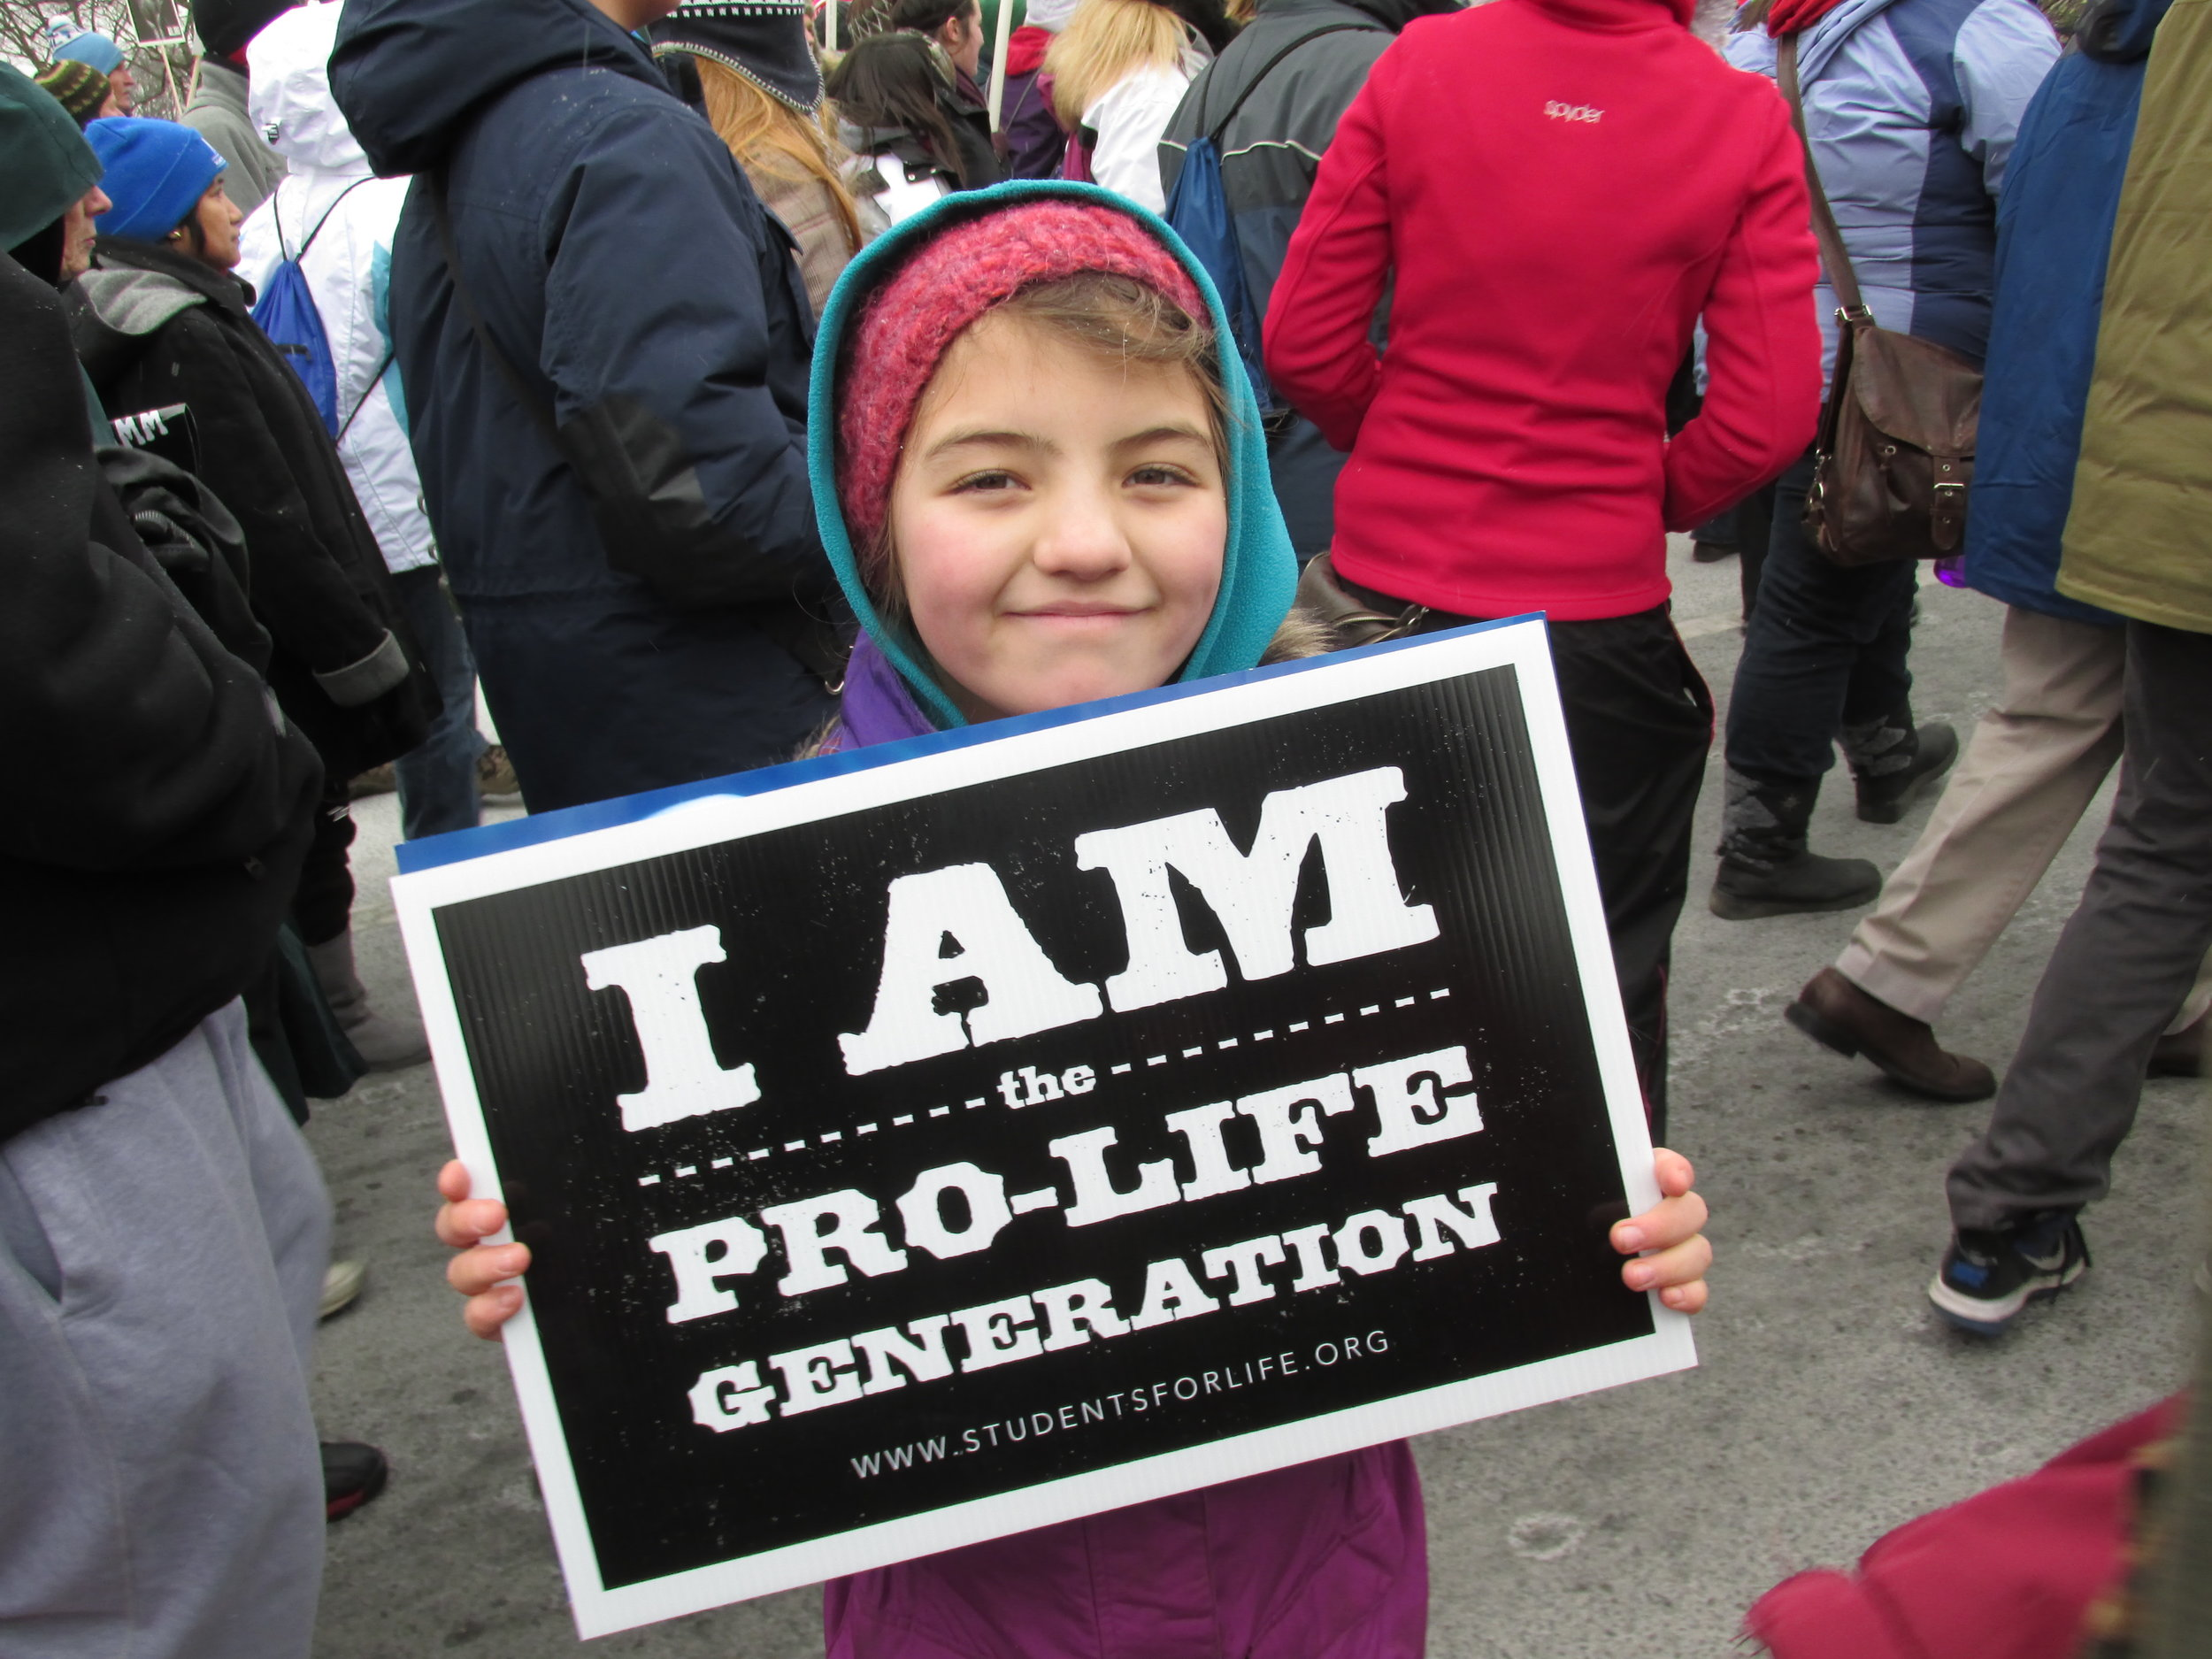 March_for_Life,_Washington,_D.C._(2013).JPG